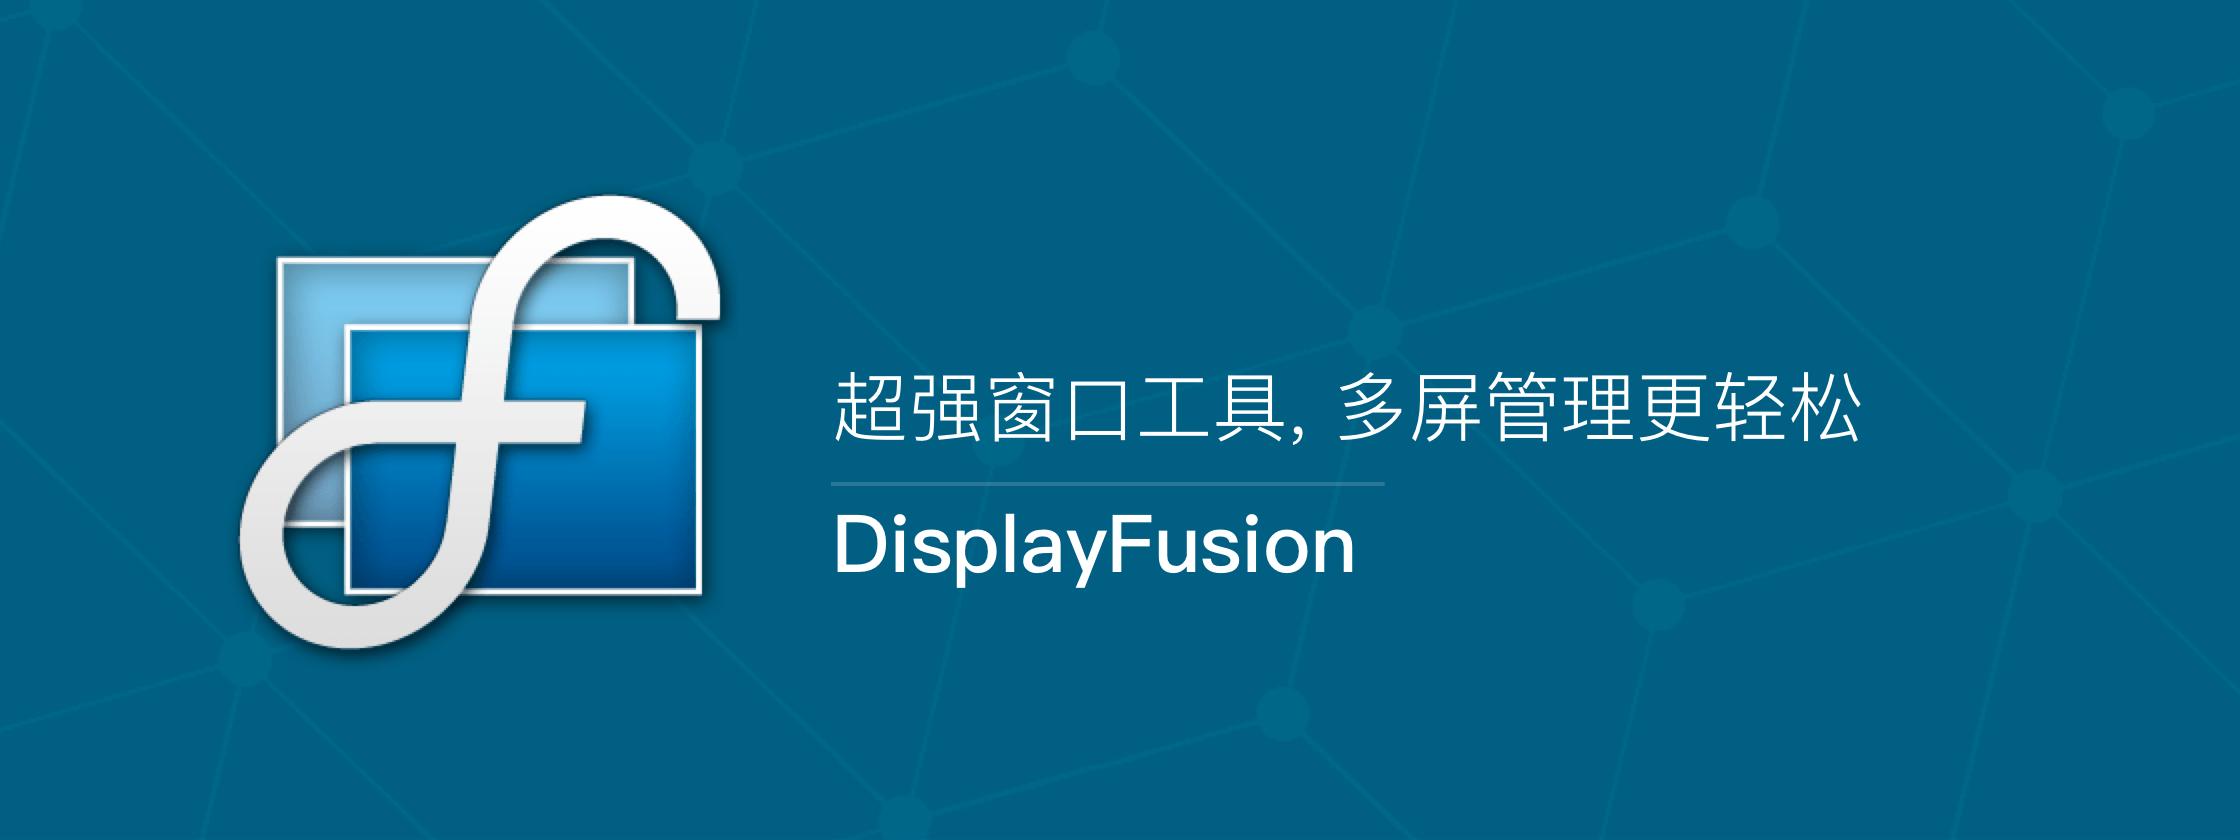 DisplayFusion Pro – 超强窗口工具, 多屏管理更轻松